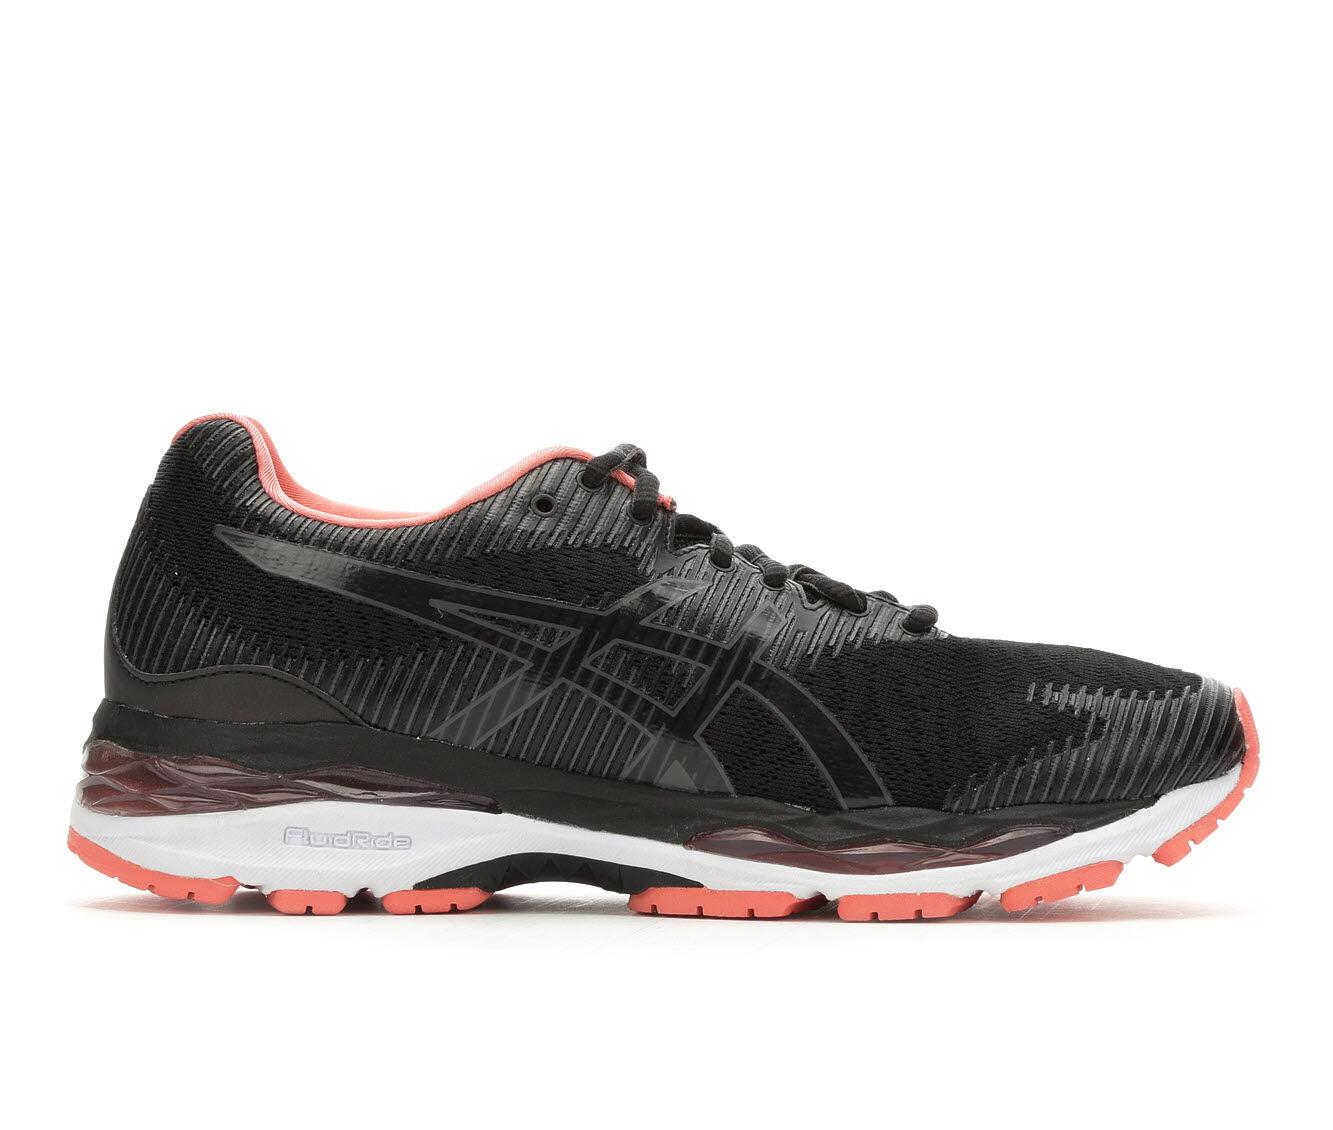 uk shoes_kd4482